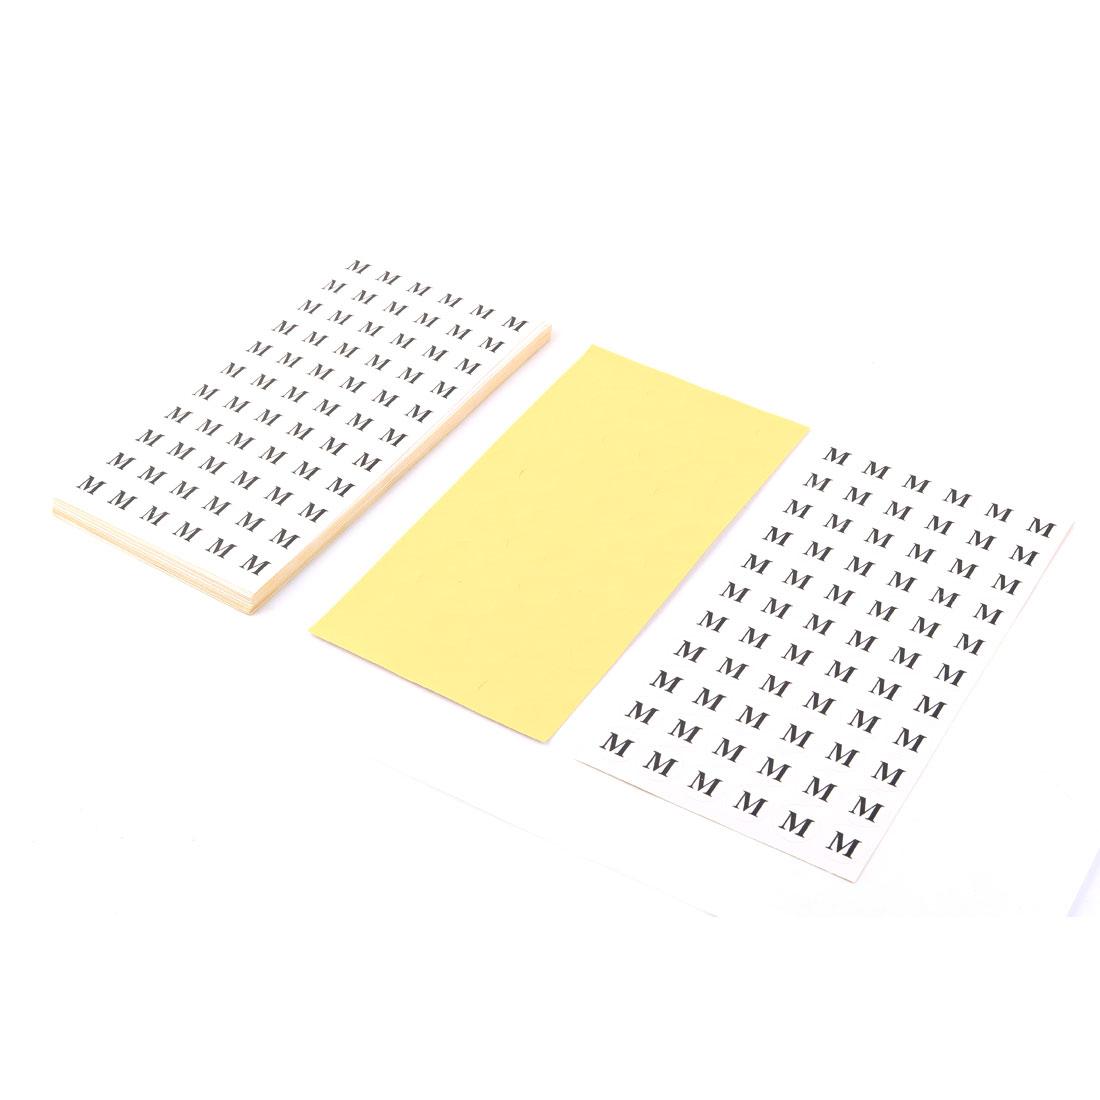 Round Shape Self Adhesive Clothing Size Label Stickers Paper M Black White 1980pcs